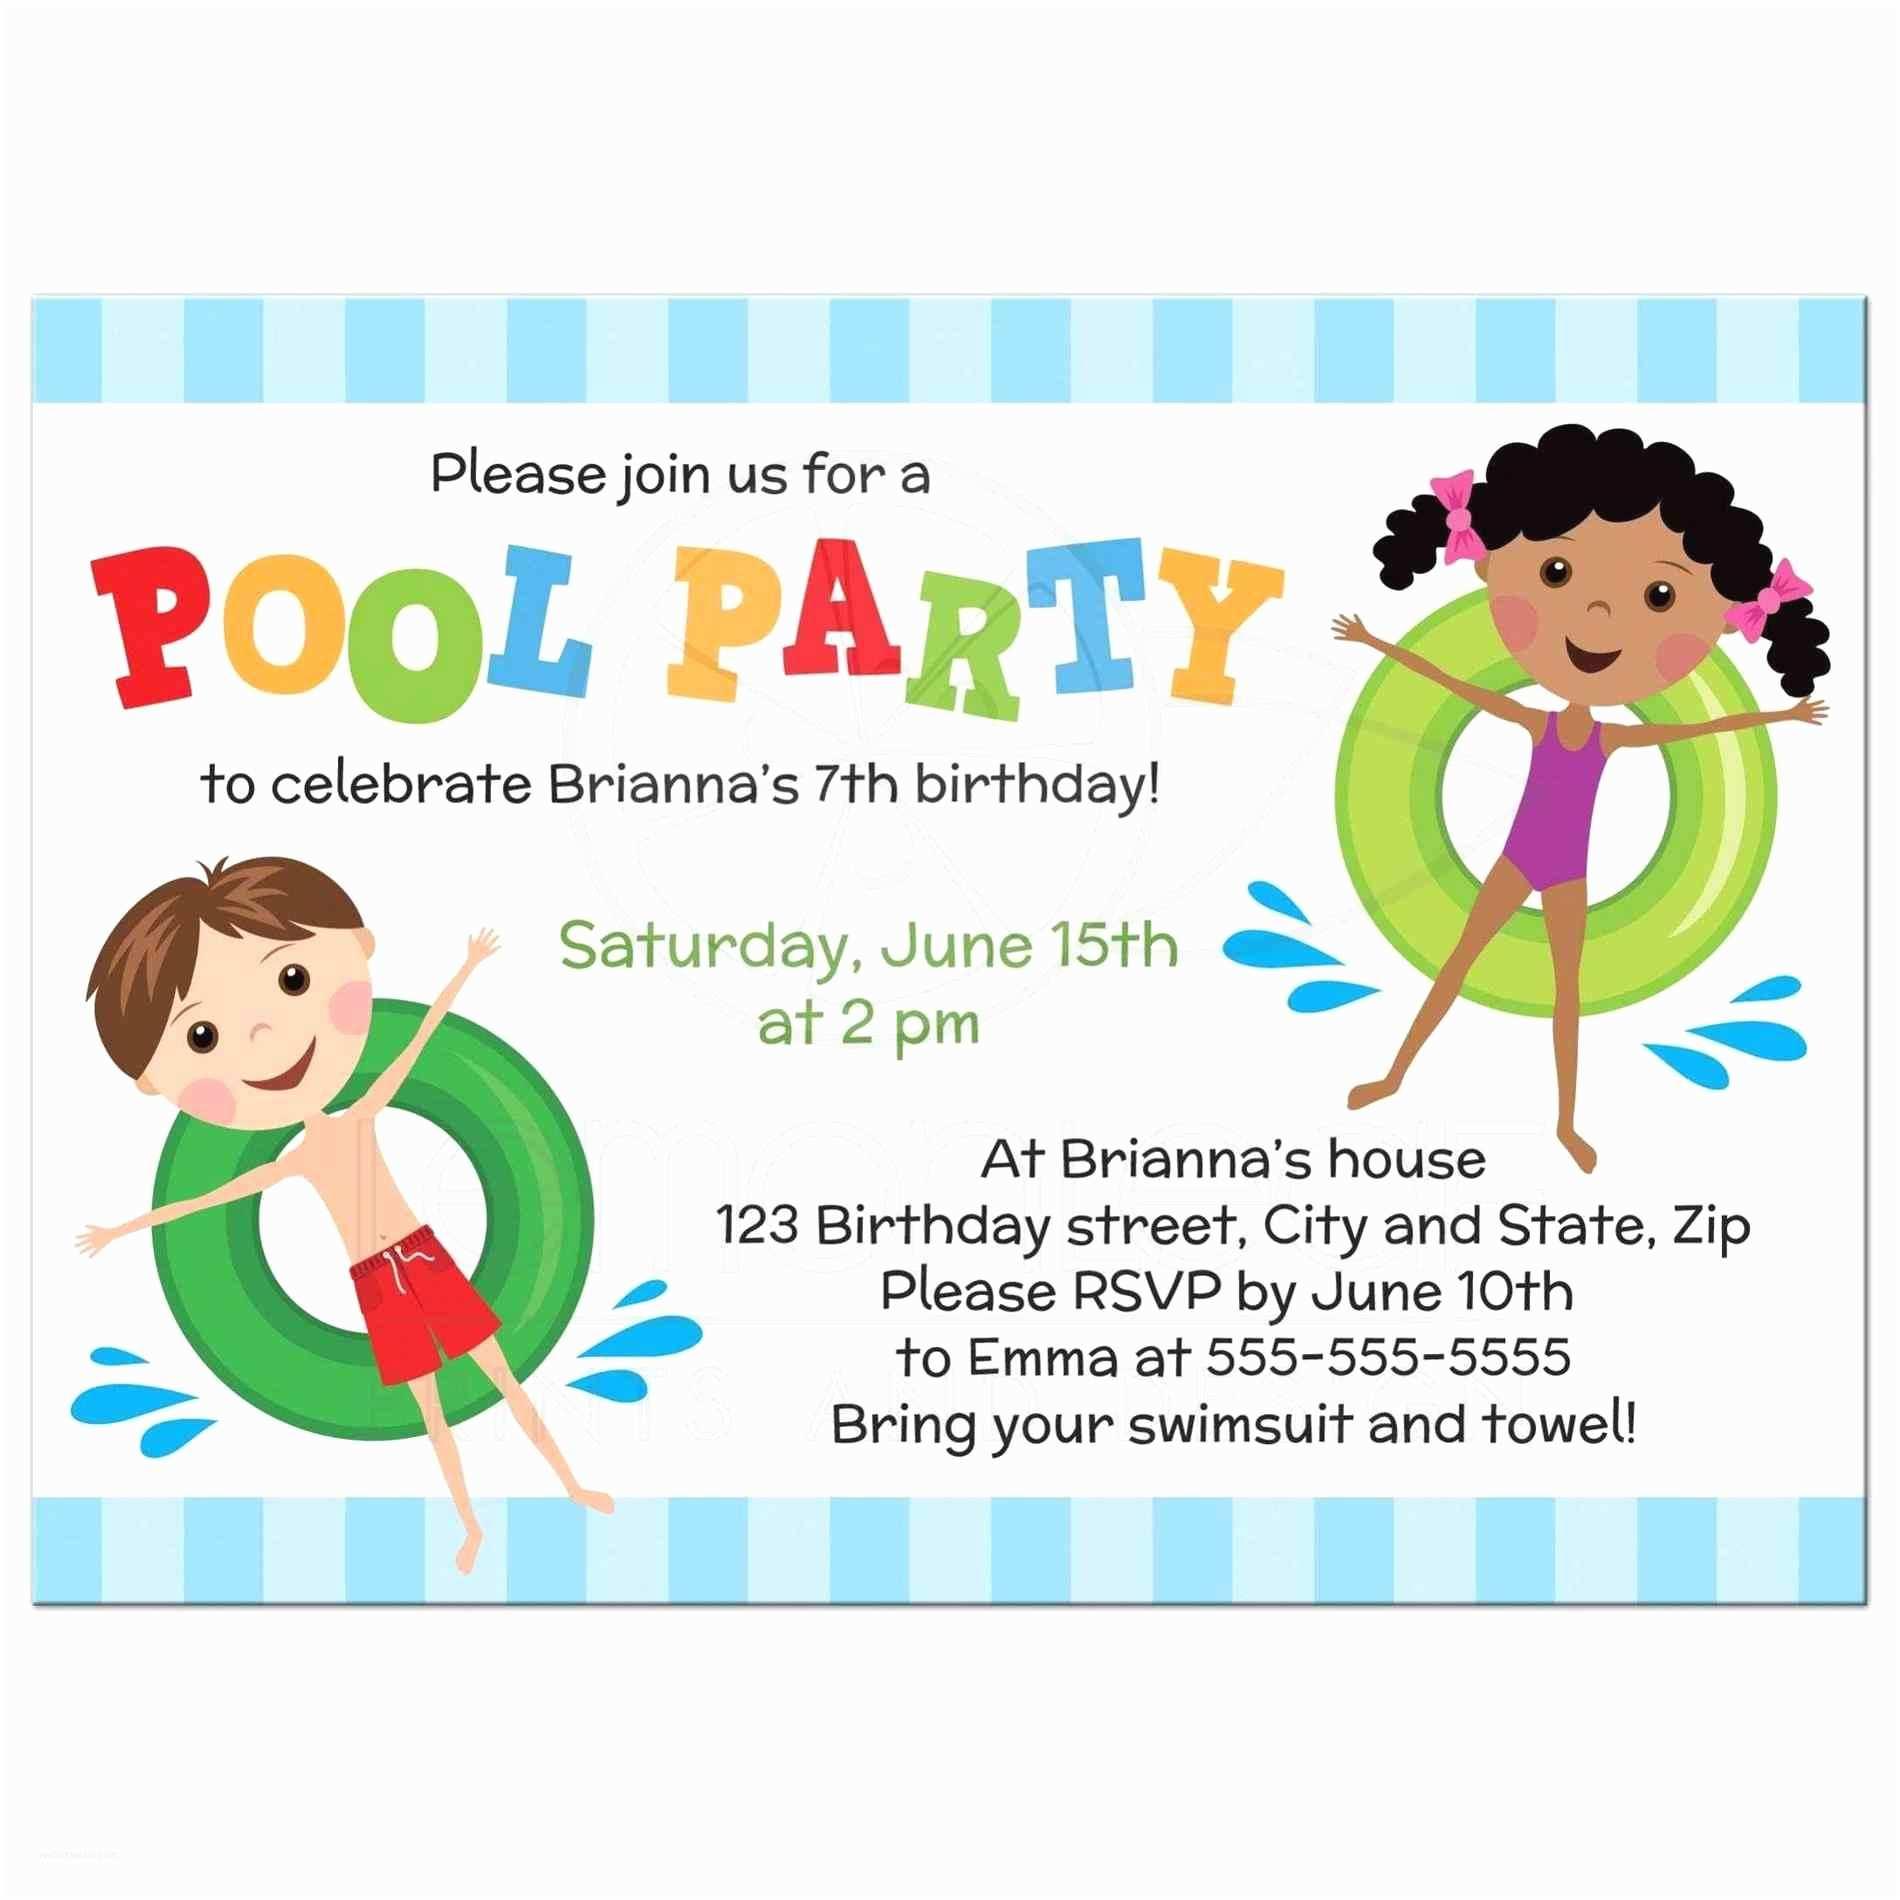 Childrens Birthday Party Invitations Free 10th Birthday Party Invitations Boy Printable S Pool